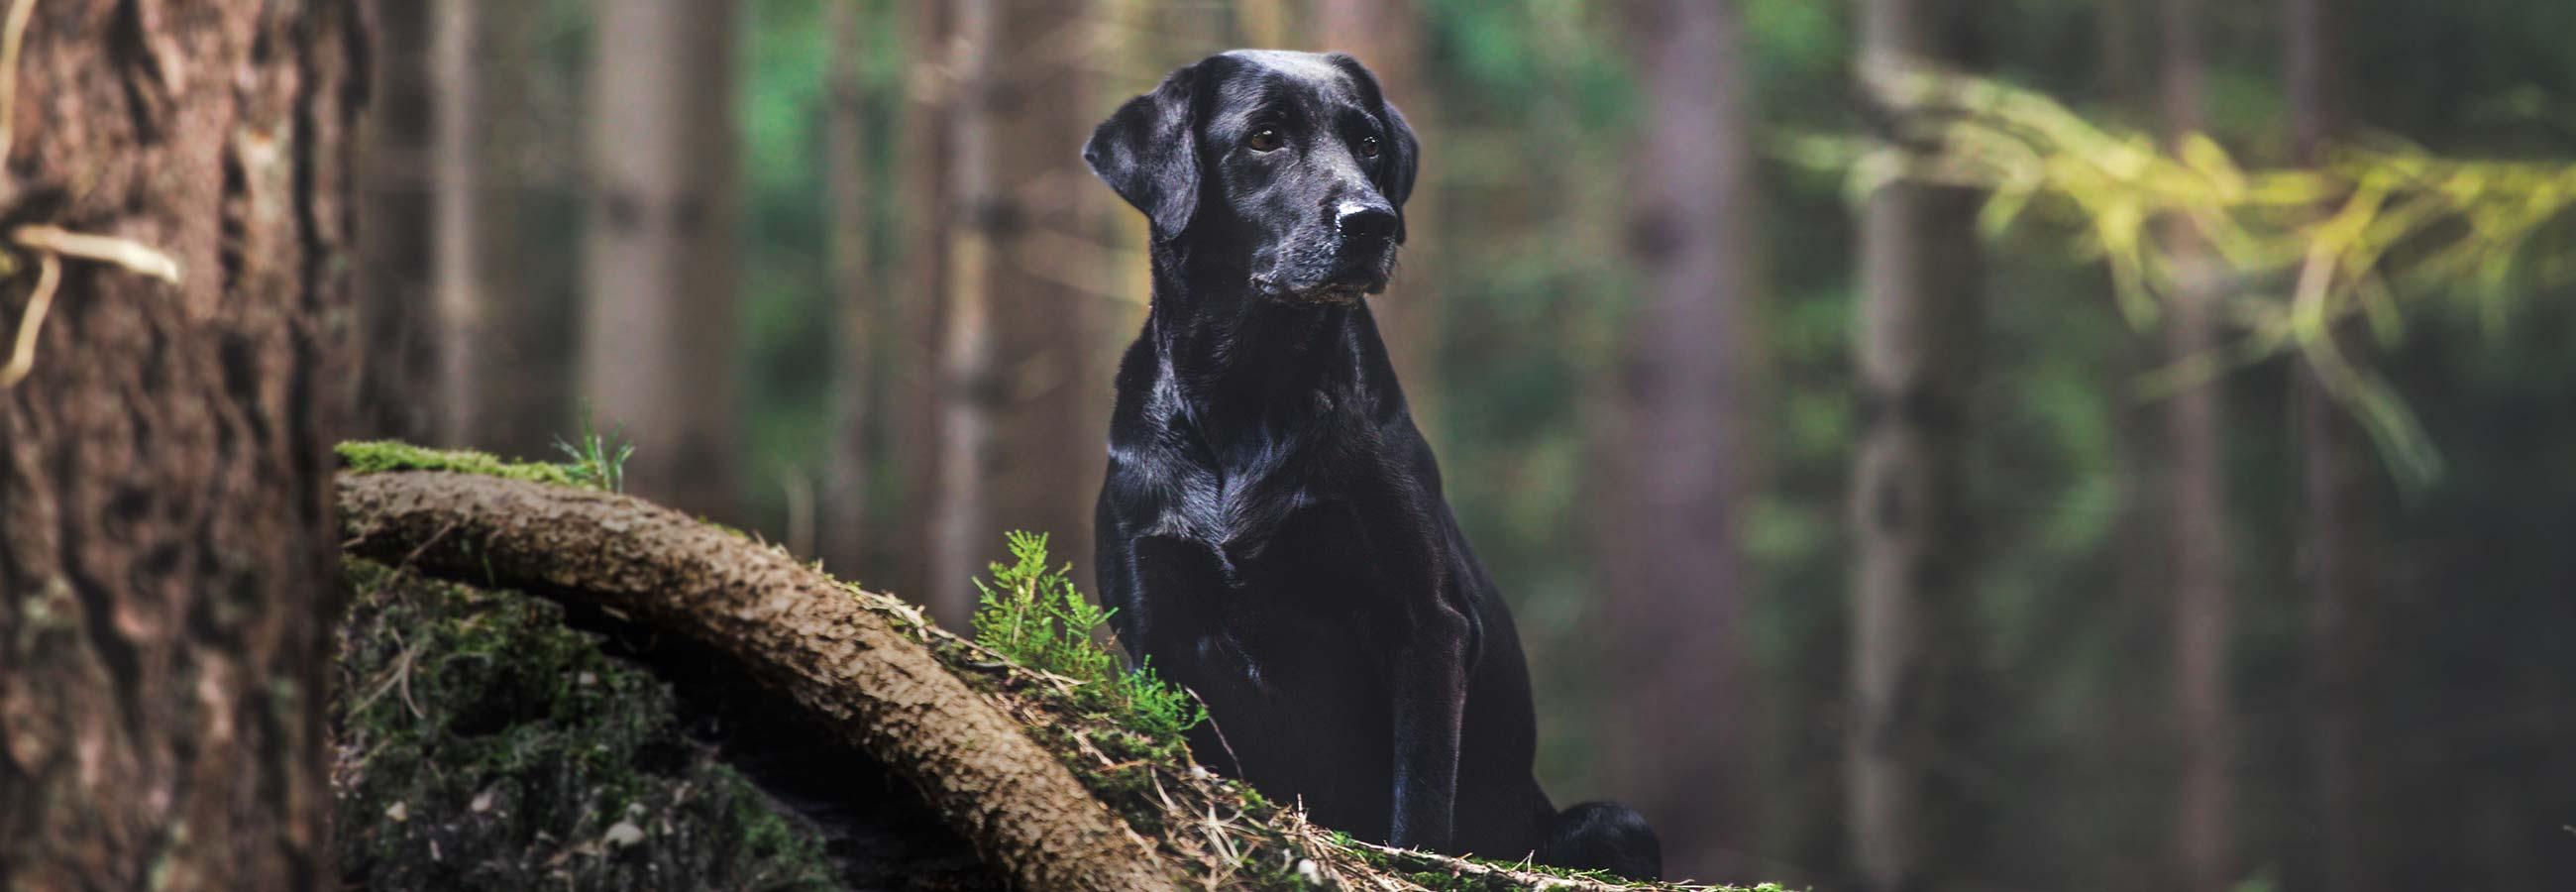 black lab sitting in forest